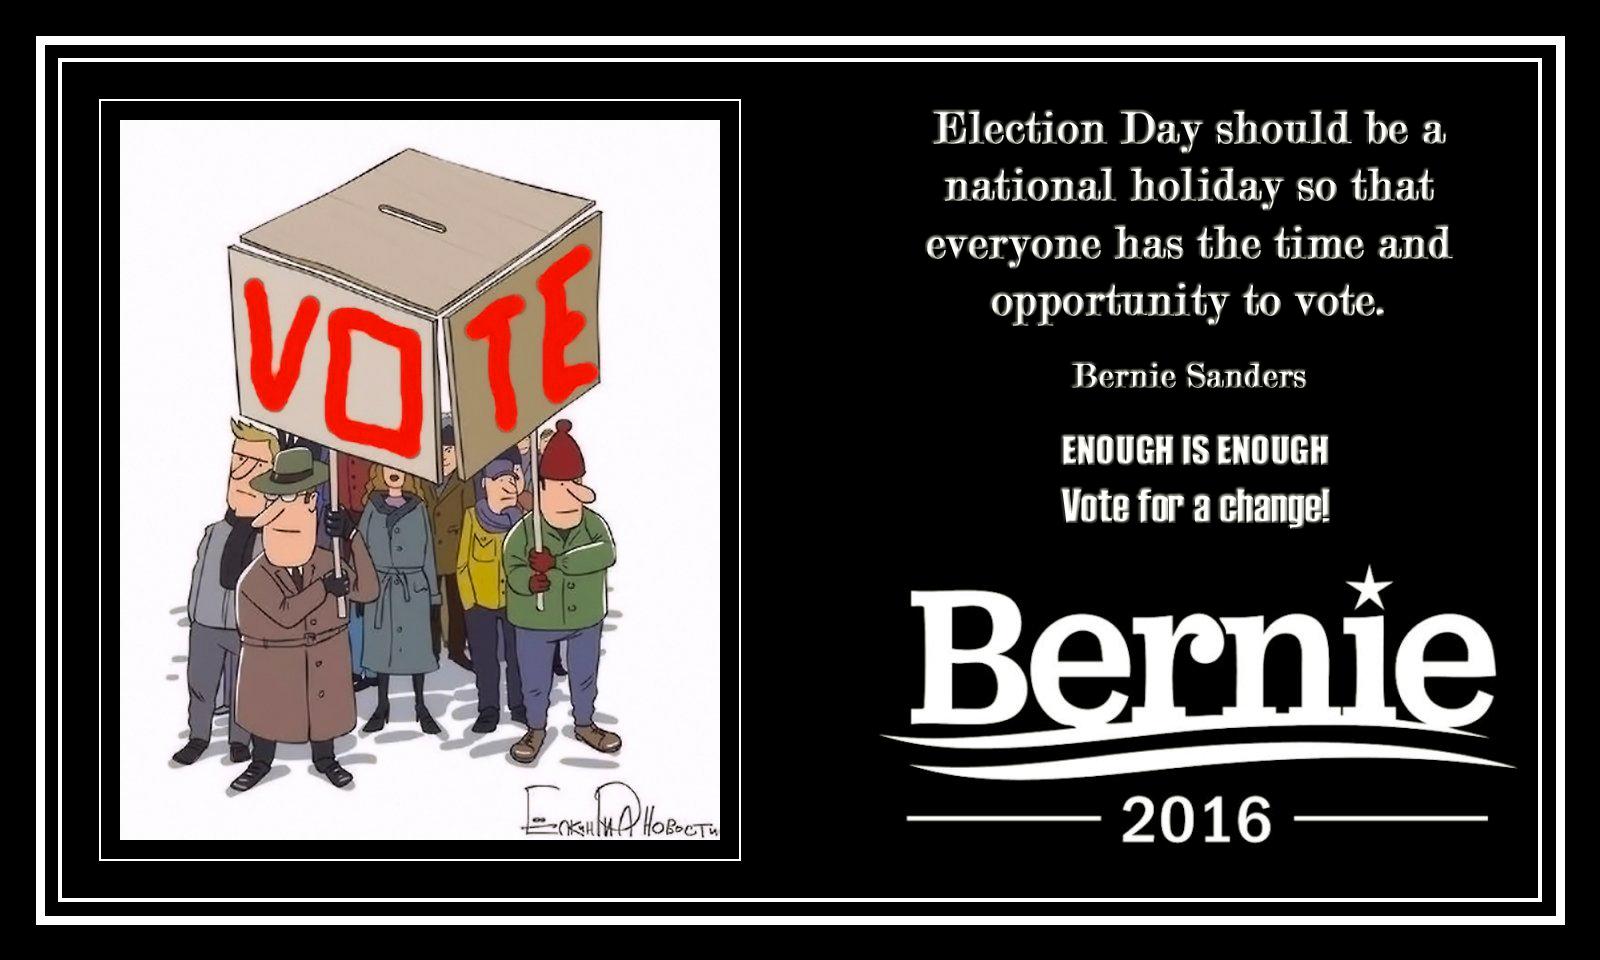 00 Bernie Sanders on election day 040915